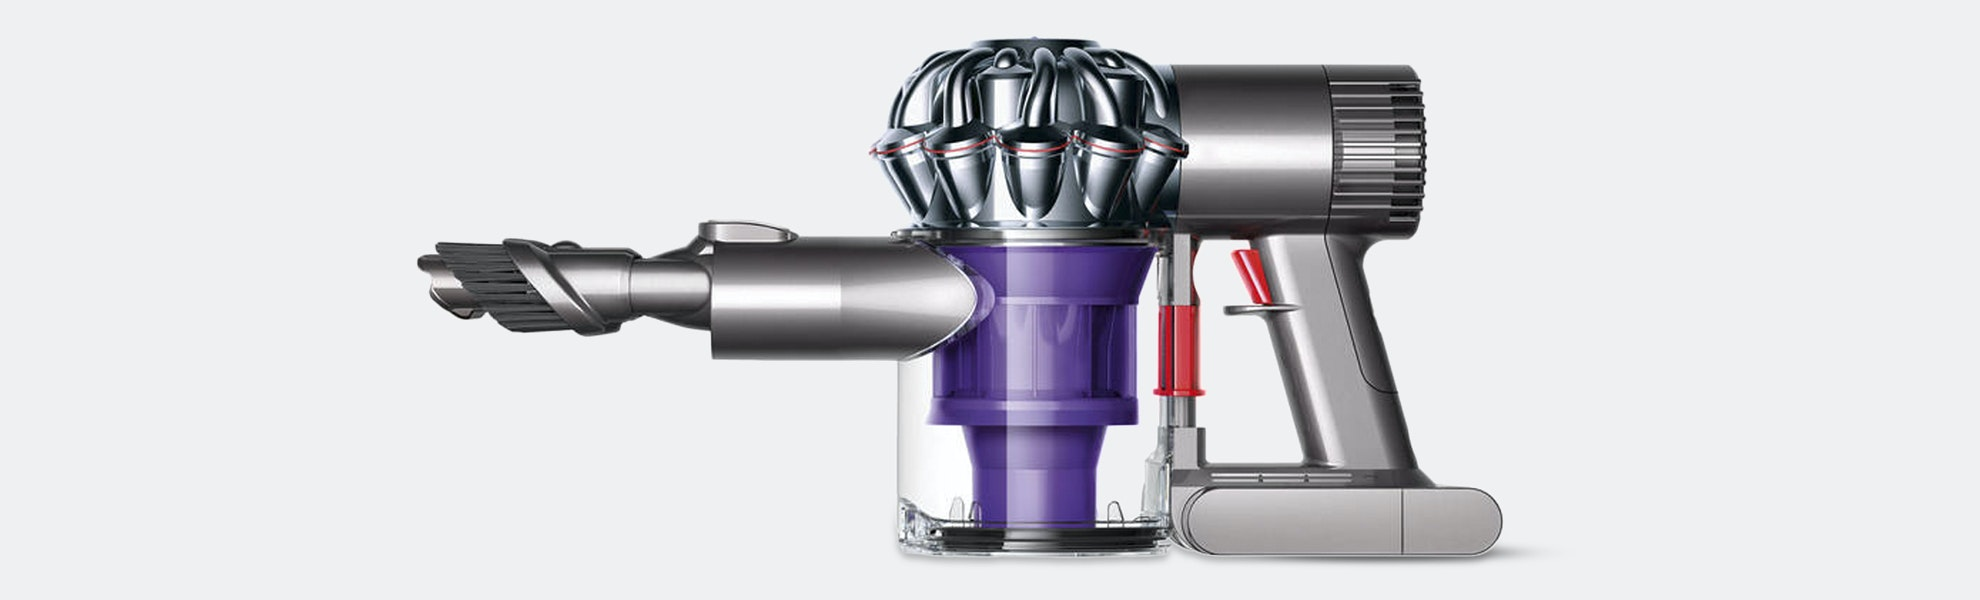 Dyson V6 Trigger Bagless Handheld Vacuum